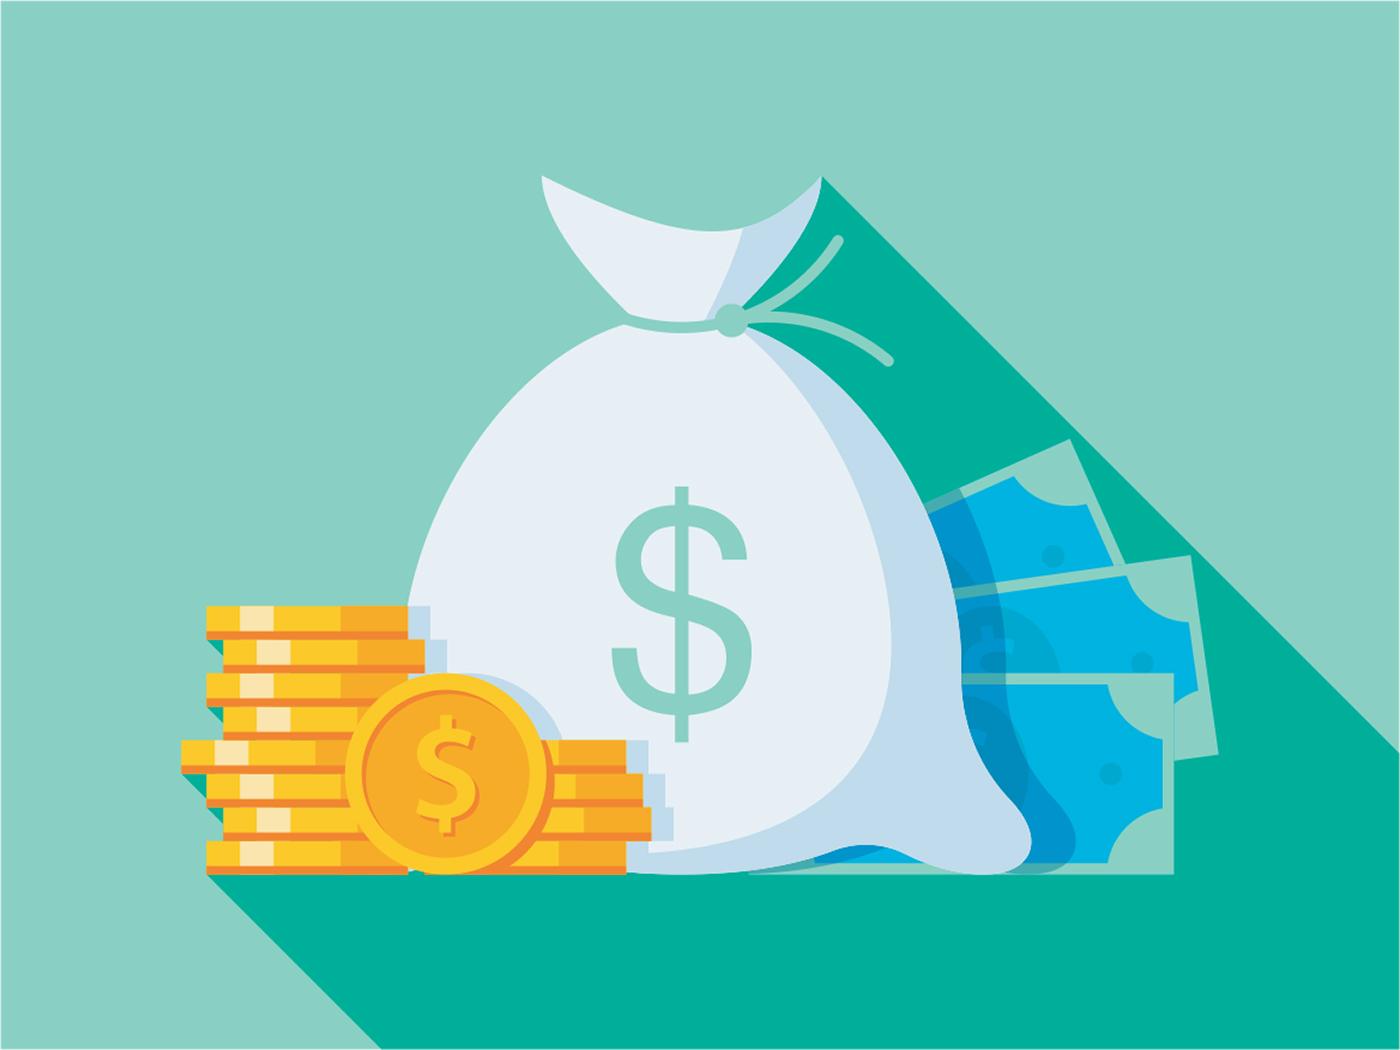 An illustration of money